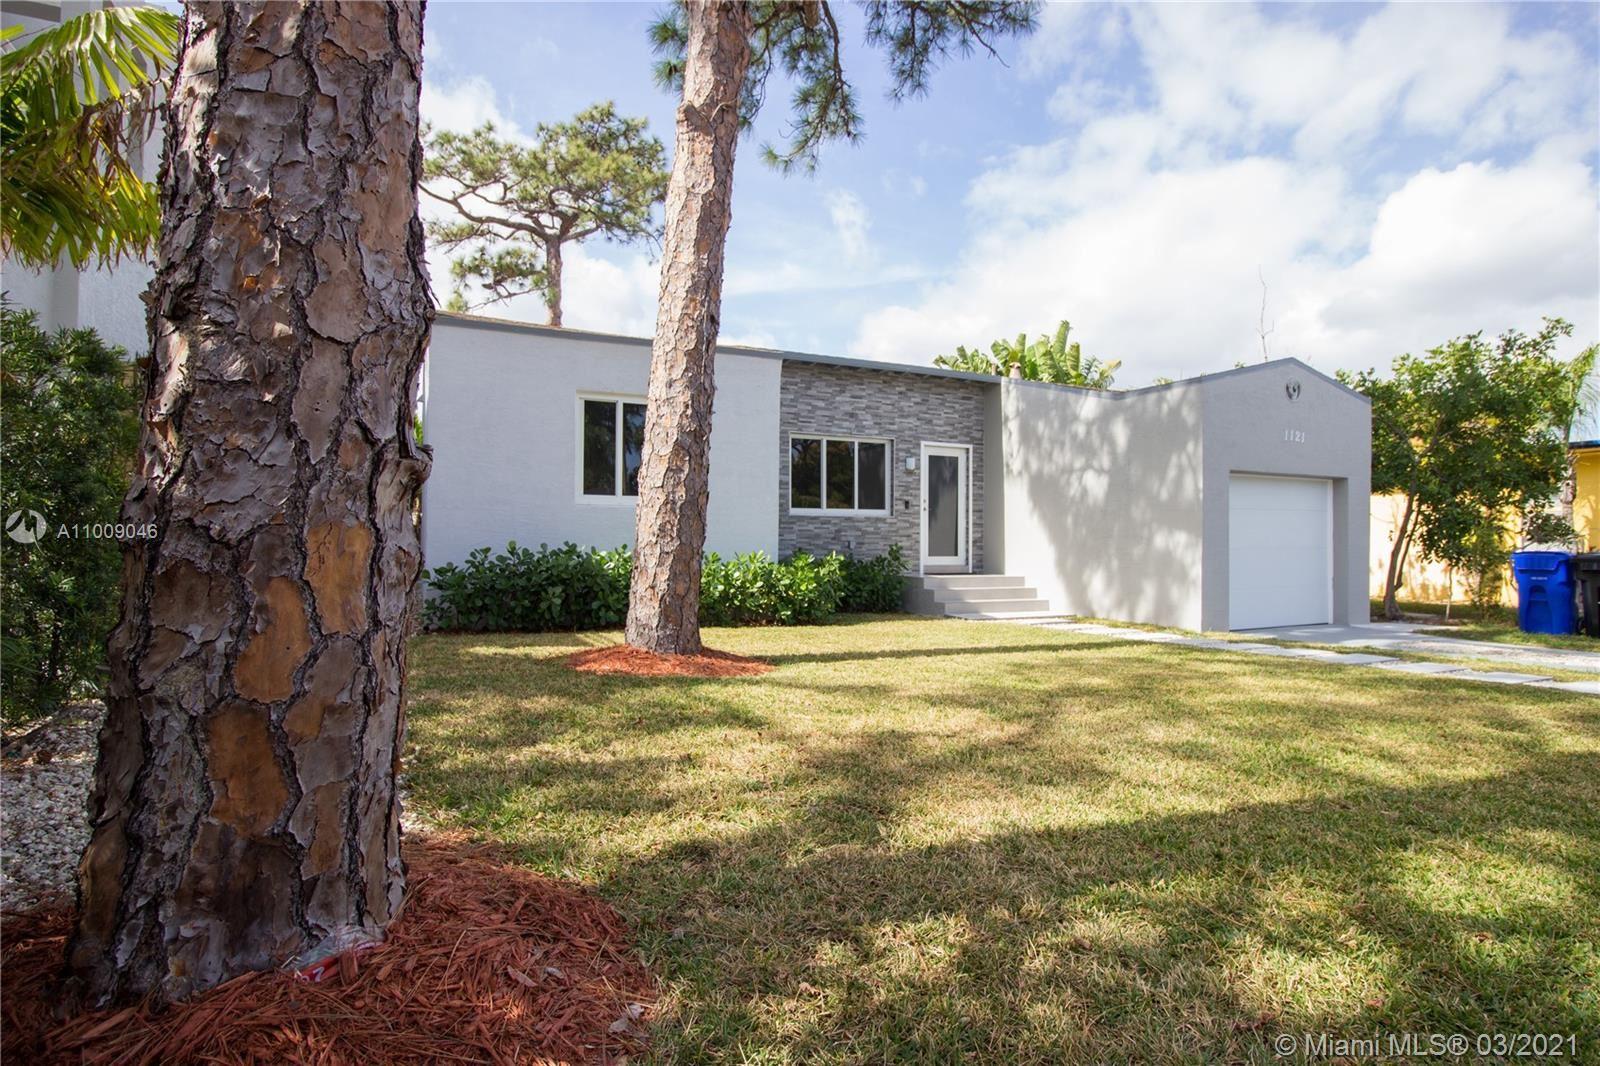 1121 NE 16th Ave, Fort Lauderdale, FL 33304 - #: A11009046